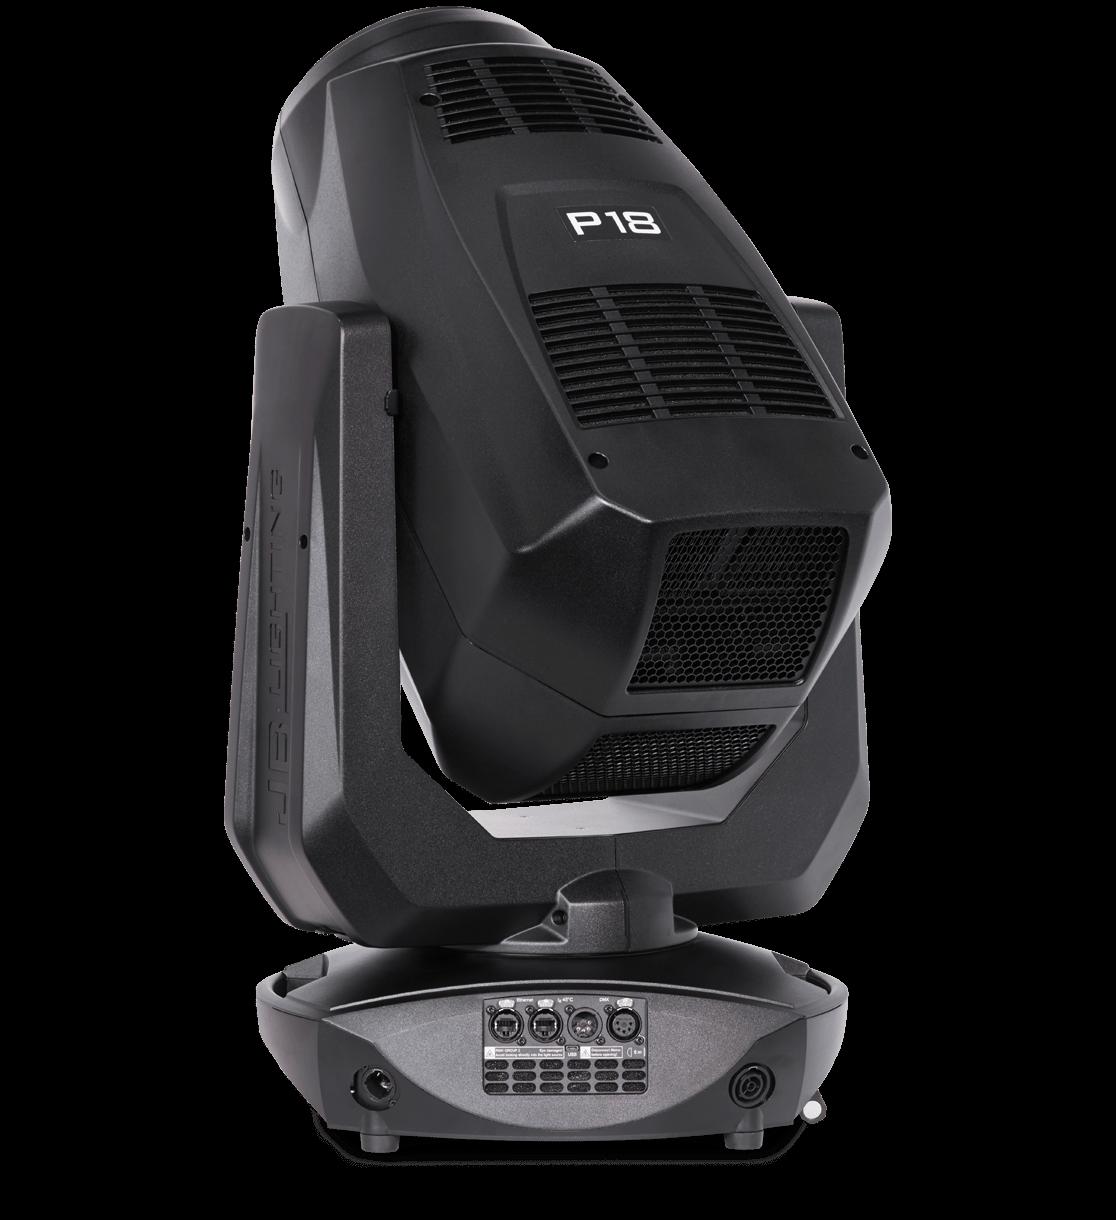 JB-LIGHTING P18 Profile